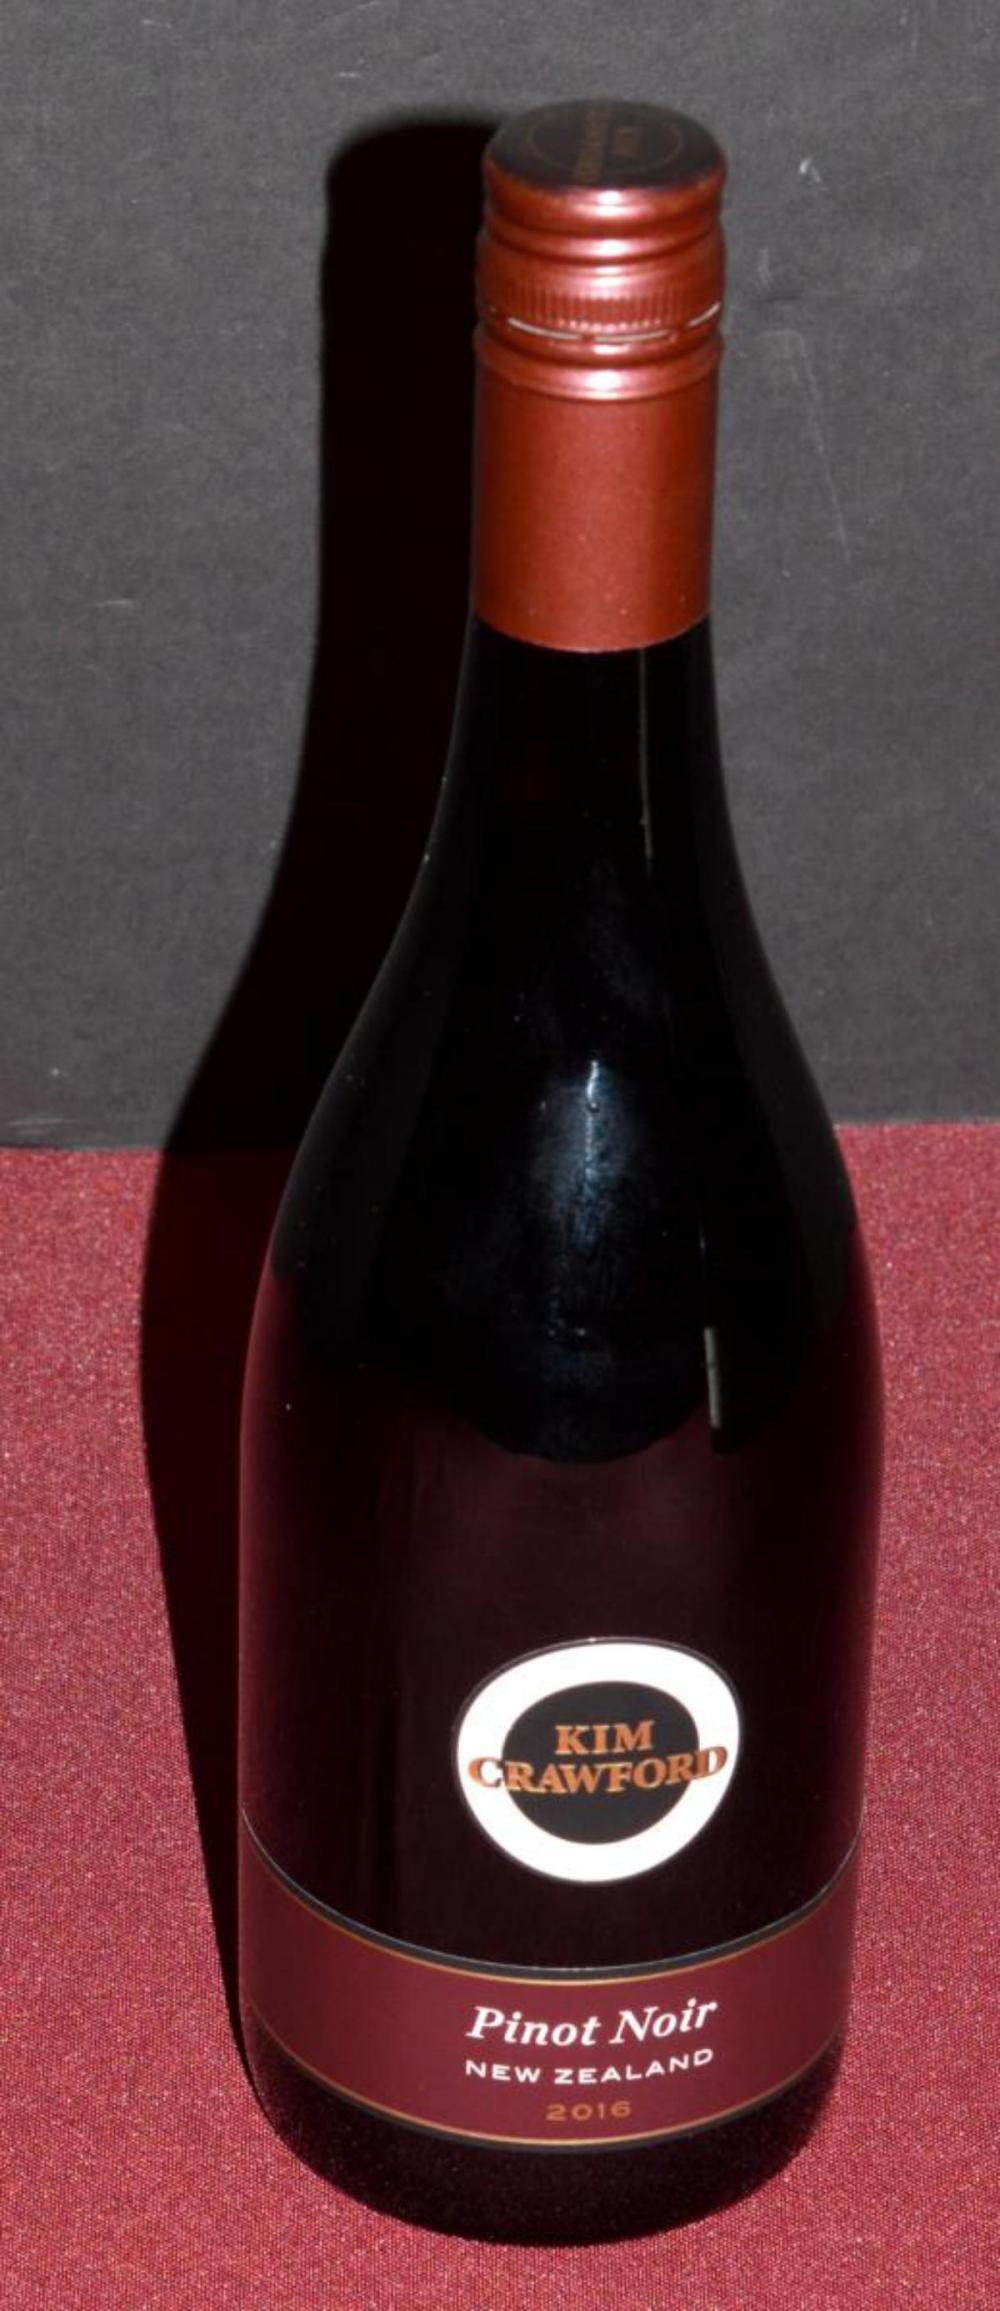 Kim Crawford Pinot Noir Wine '16 New Zealand 750ml